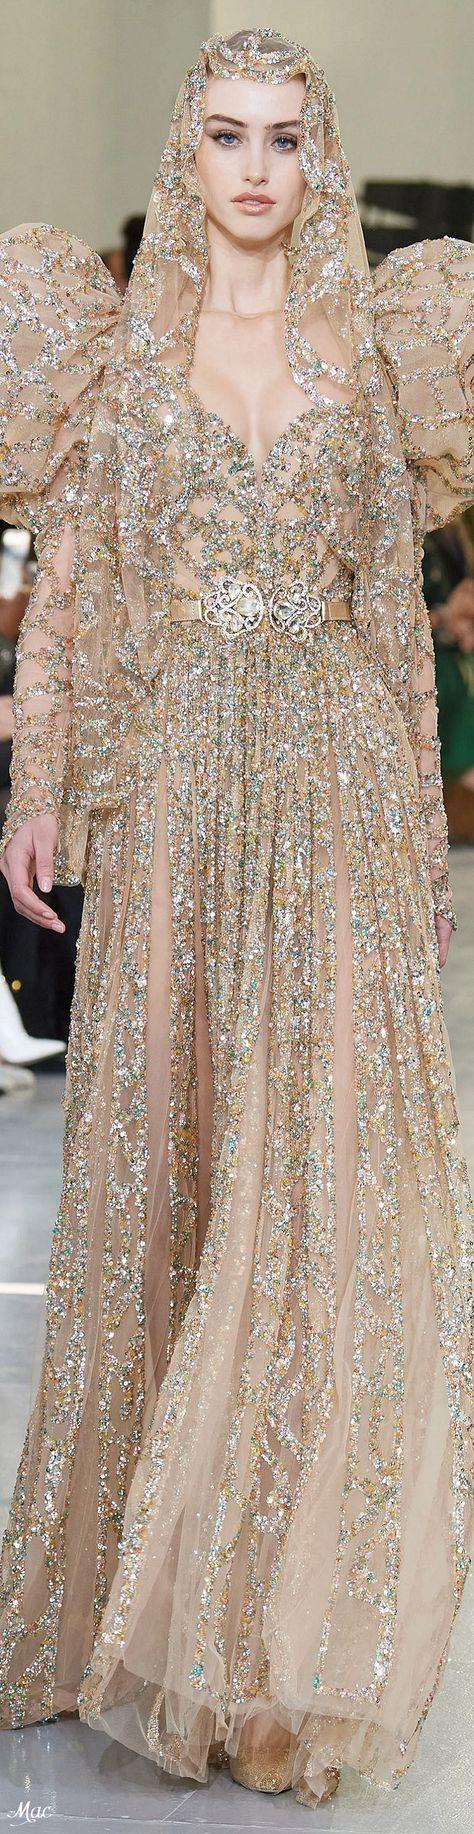 Spring 2020 Haute Couture Elie Saab